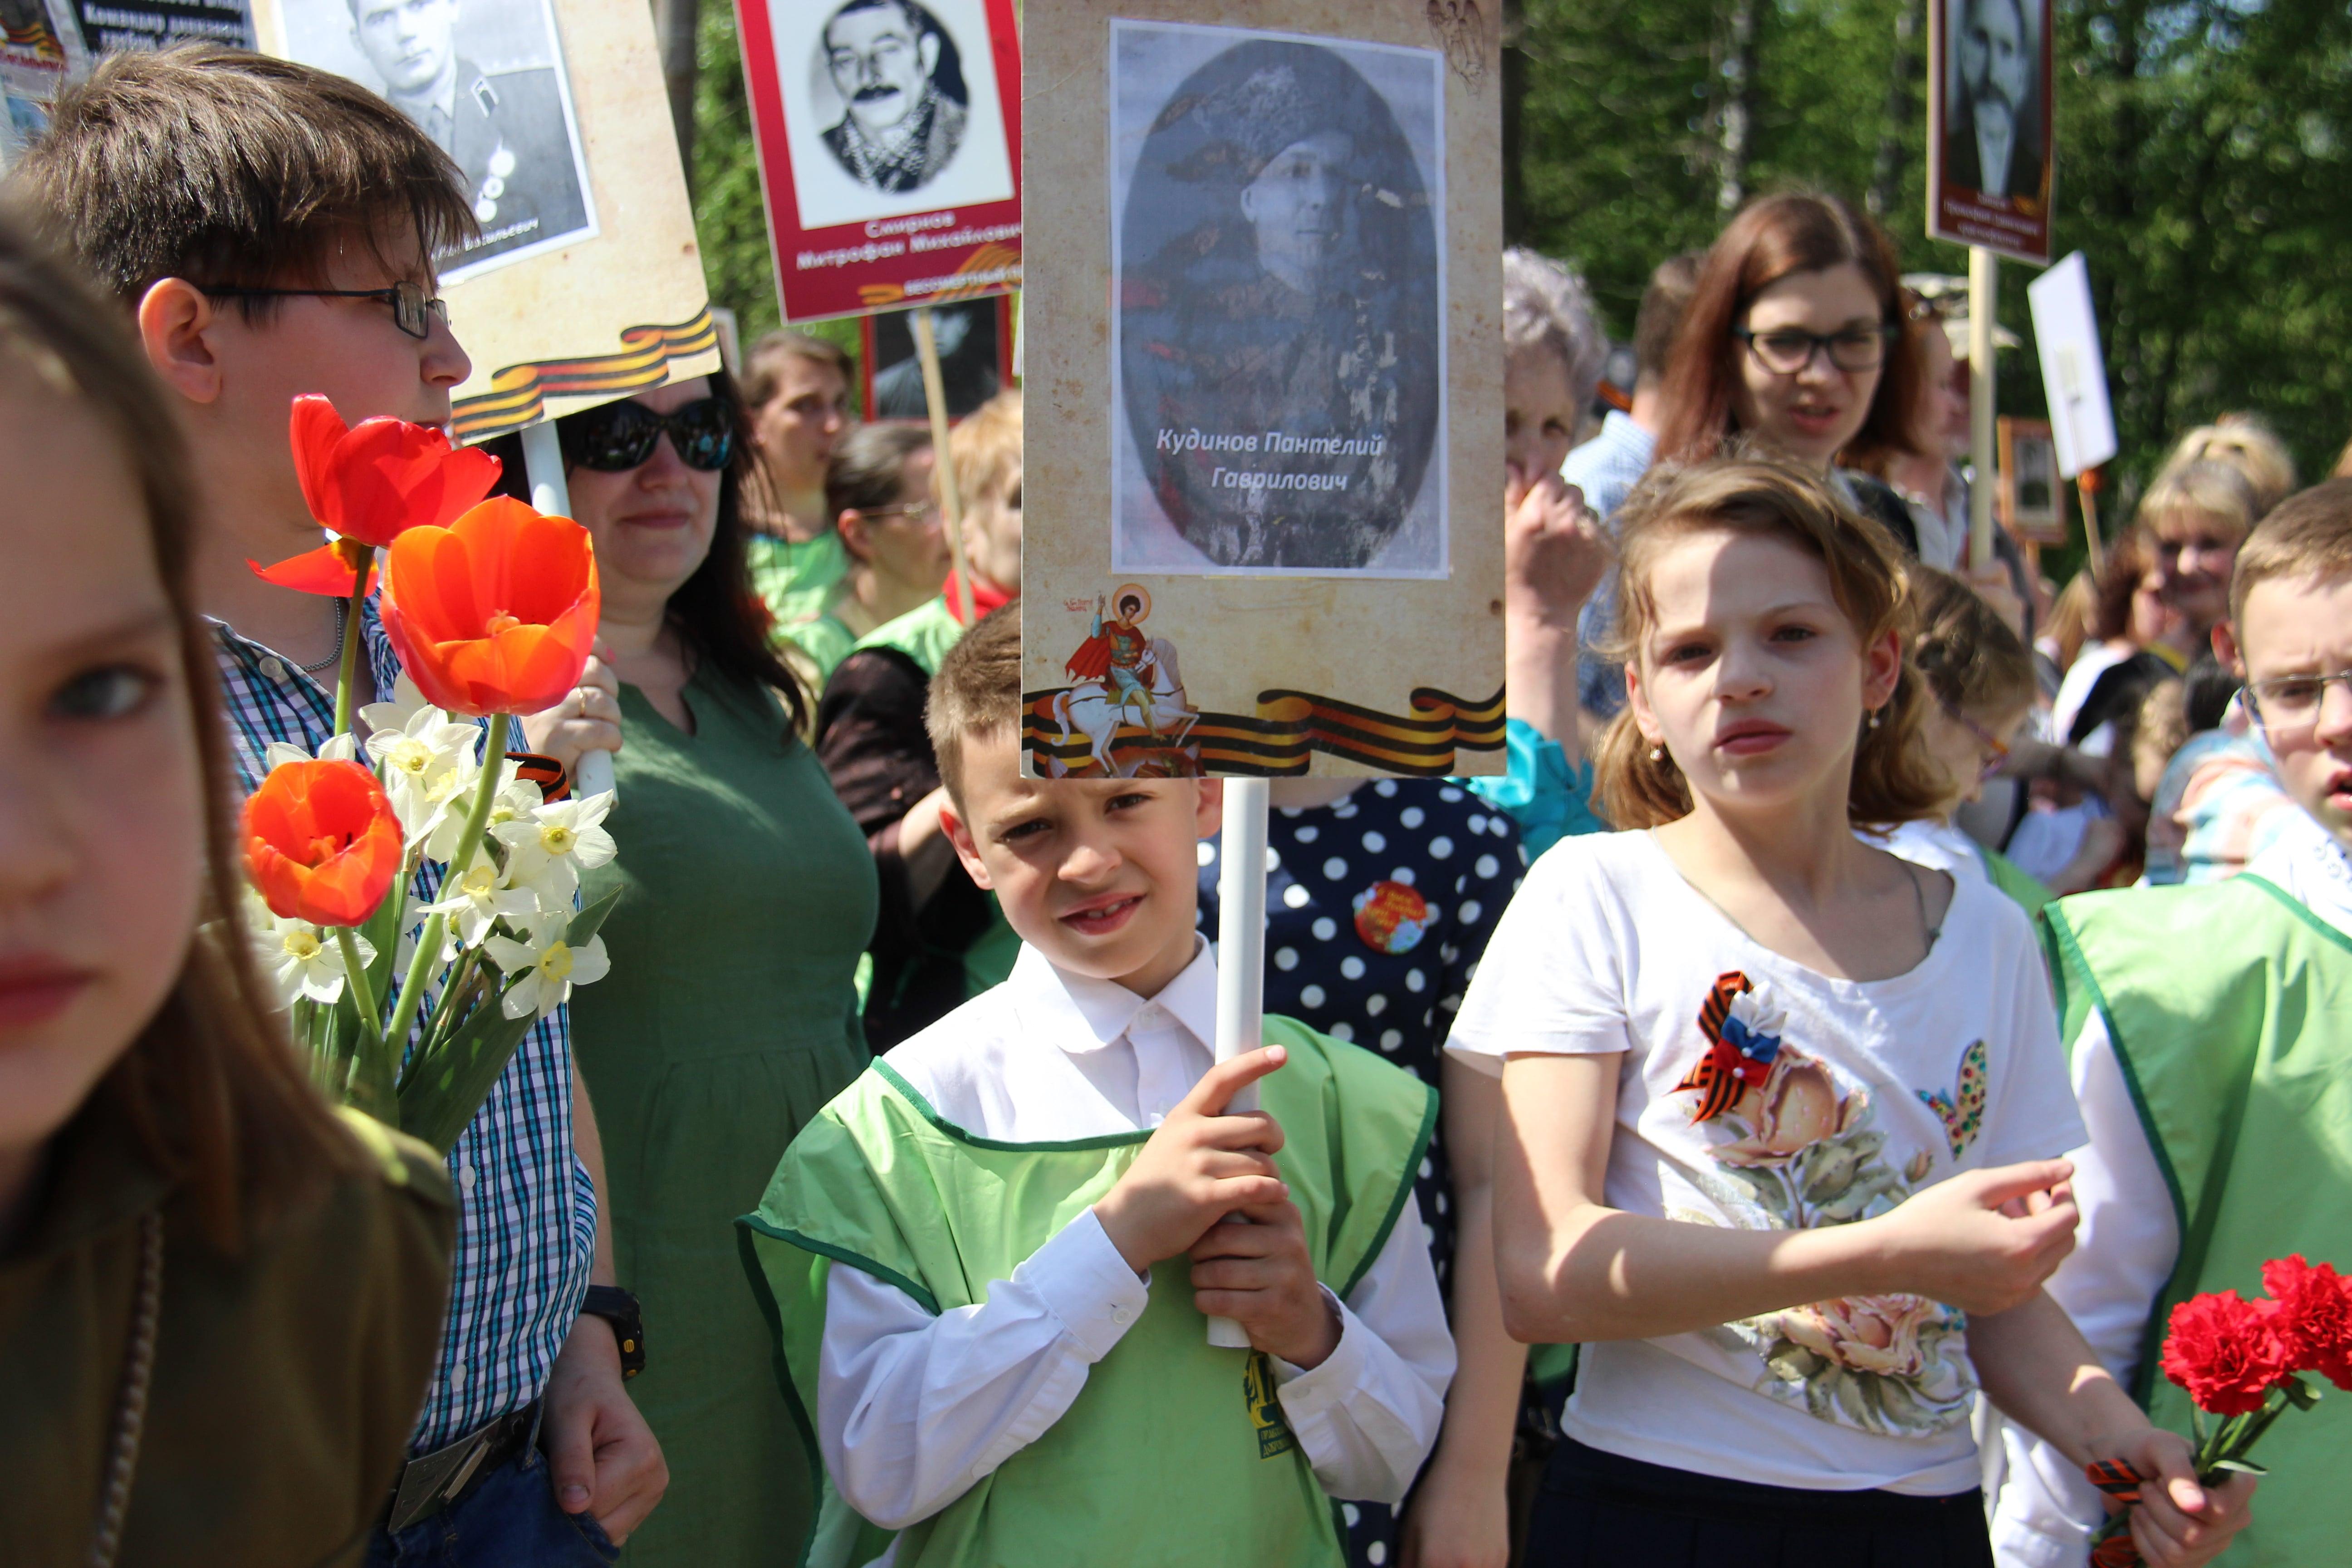 http://monuspen.ru/photoreports/ba2010941251efe9afabca220cb49d94.JPG